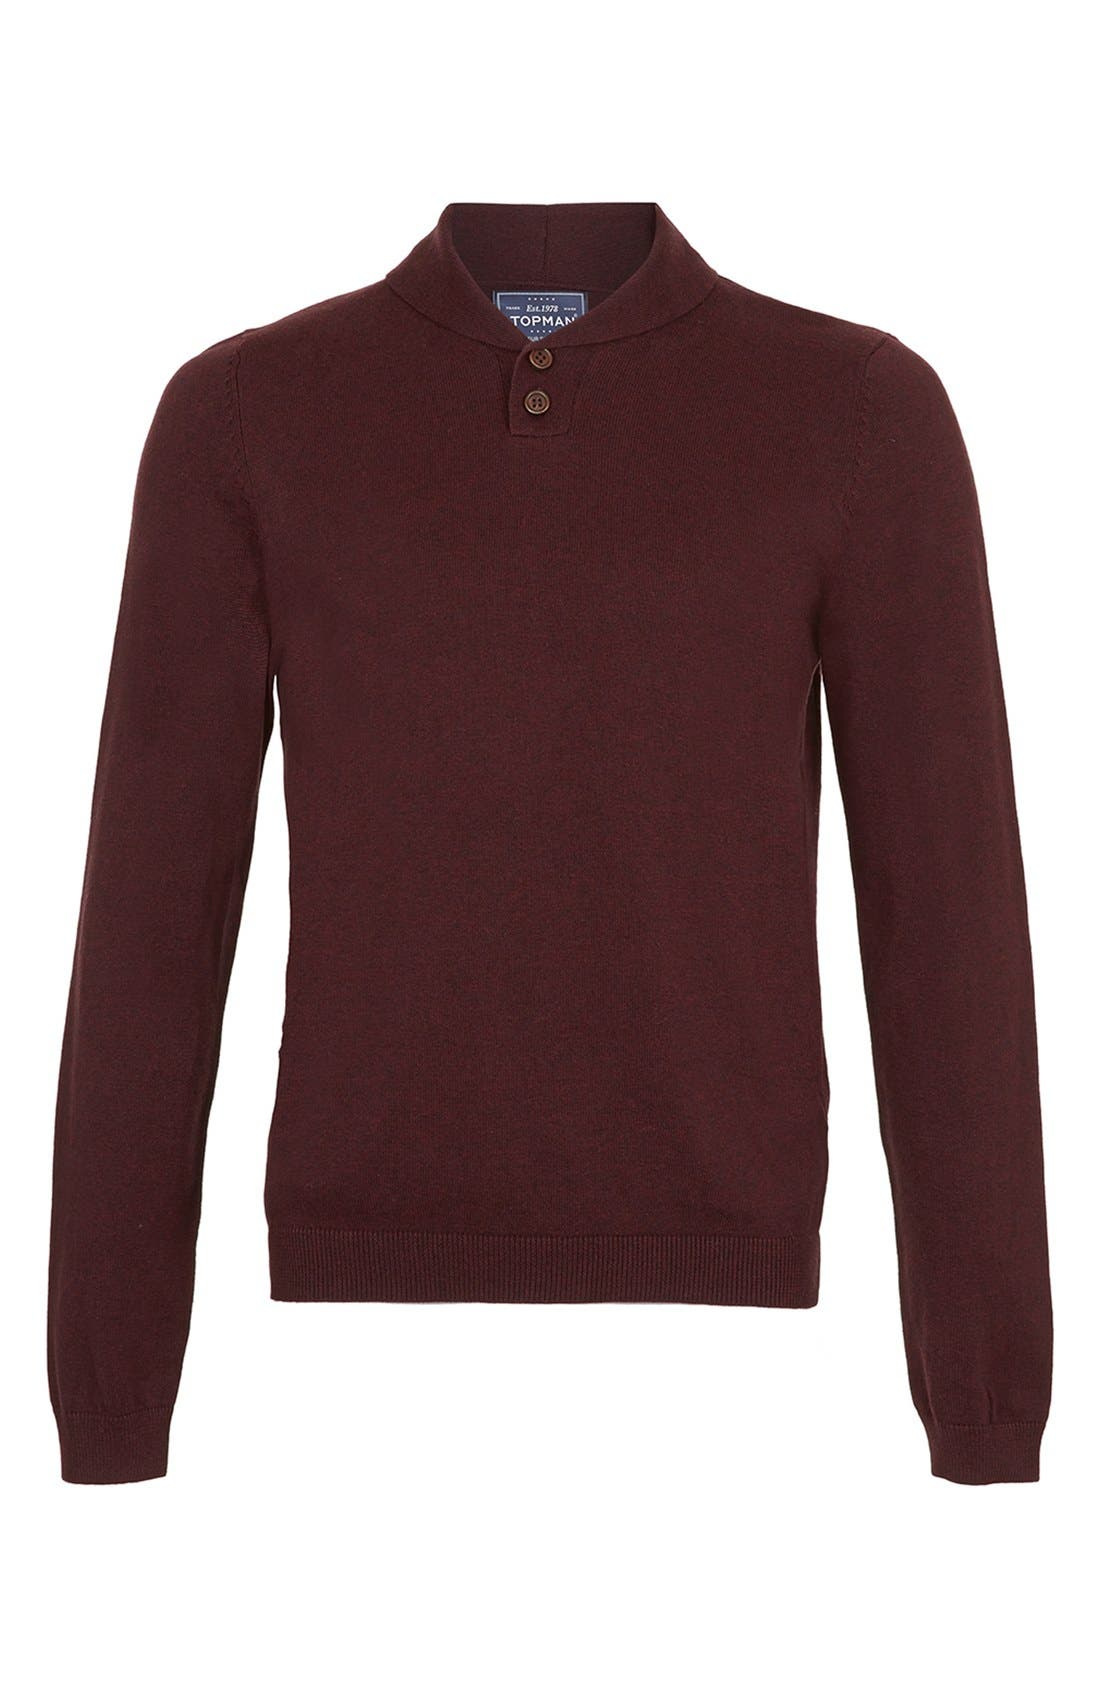 Alternate Image 1 Selected - Topman Shawl Collar Sweater